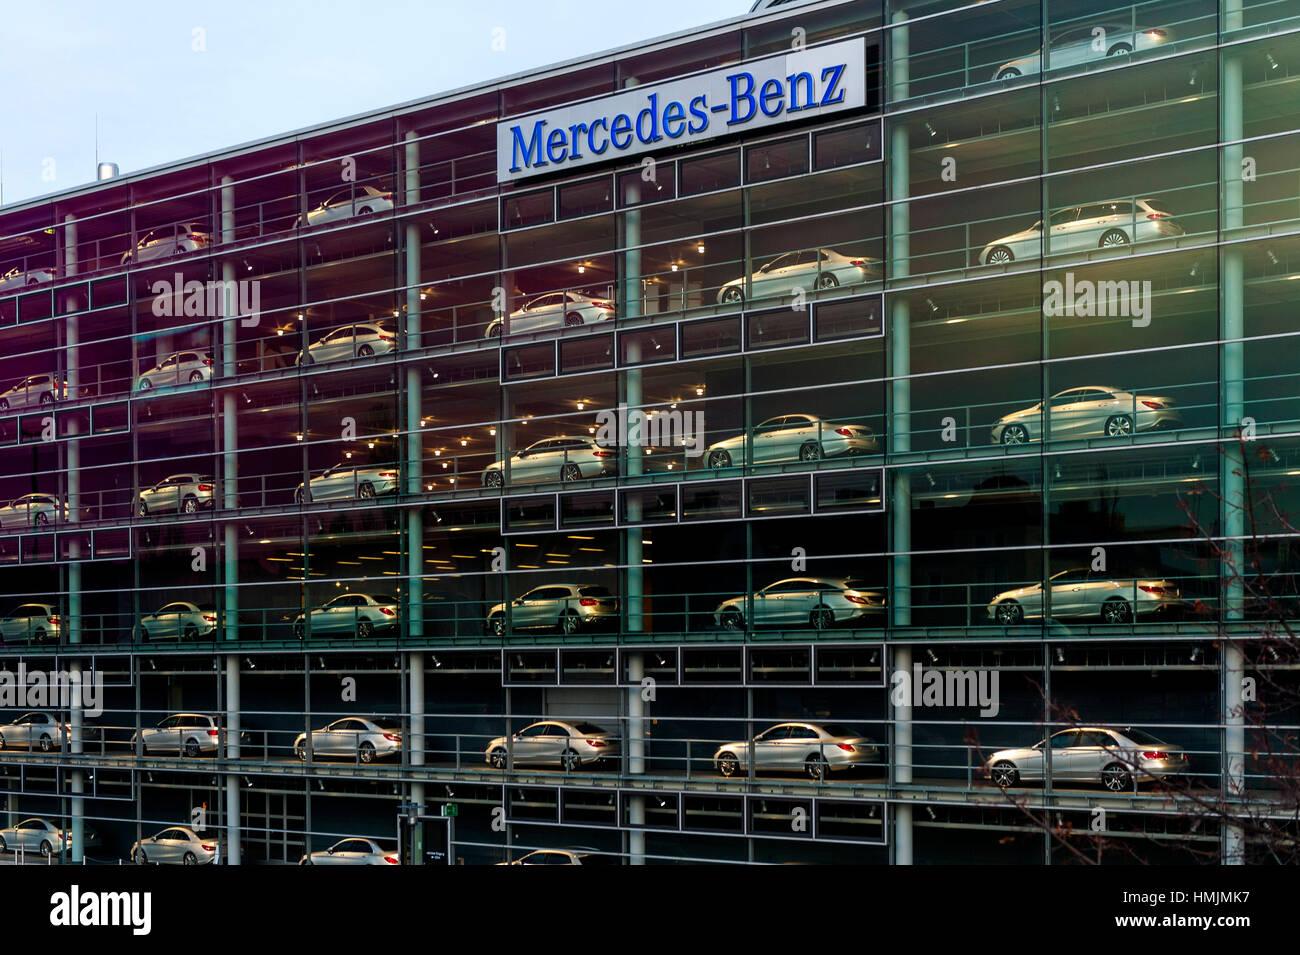 Mercedes Benz Branch Munich - Bavaria, Germany Stock Photo